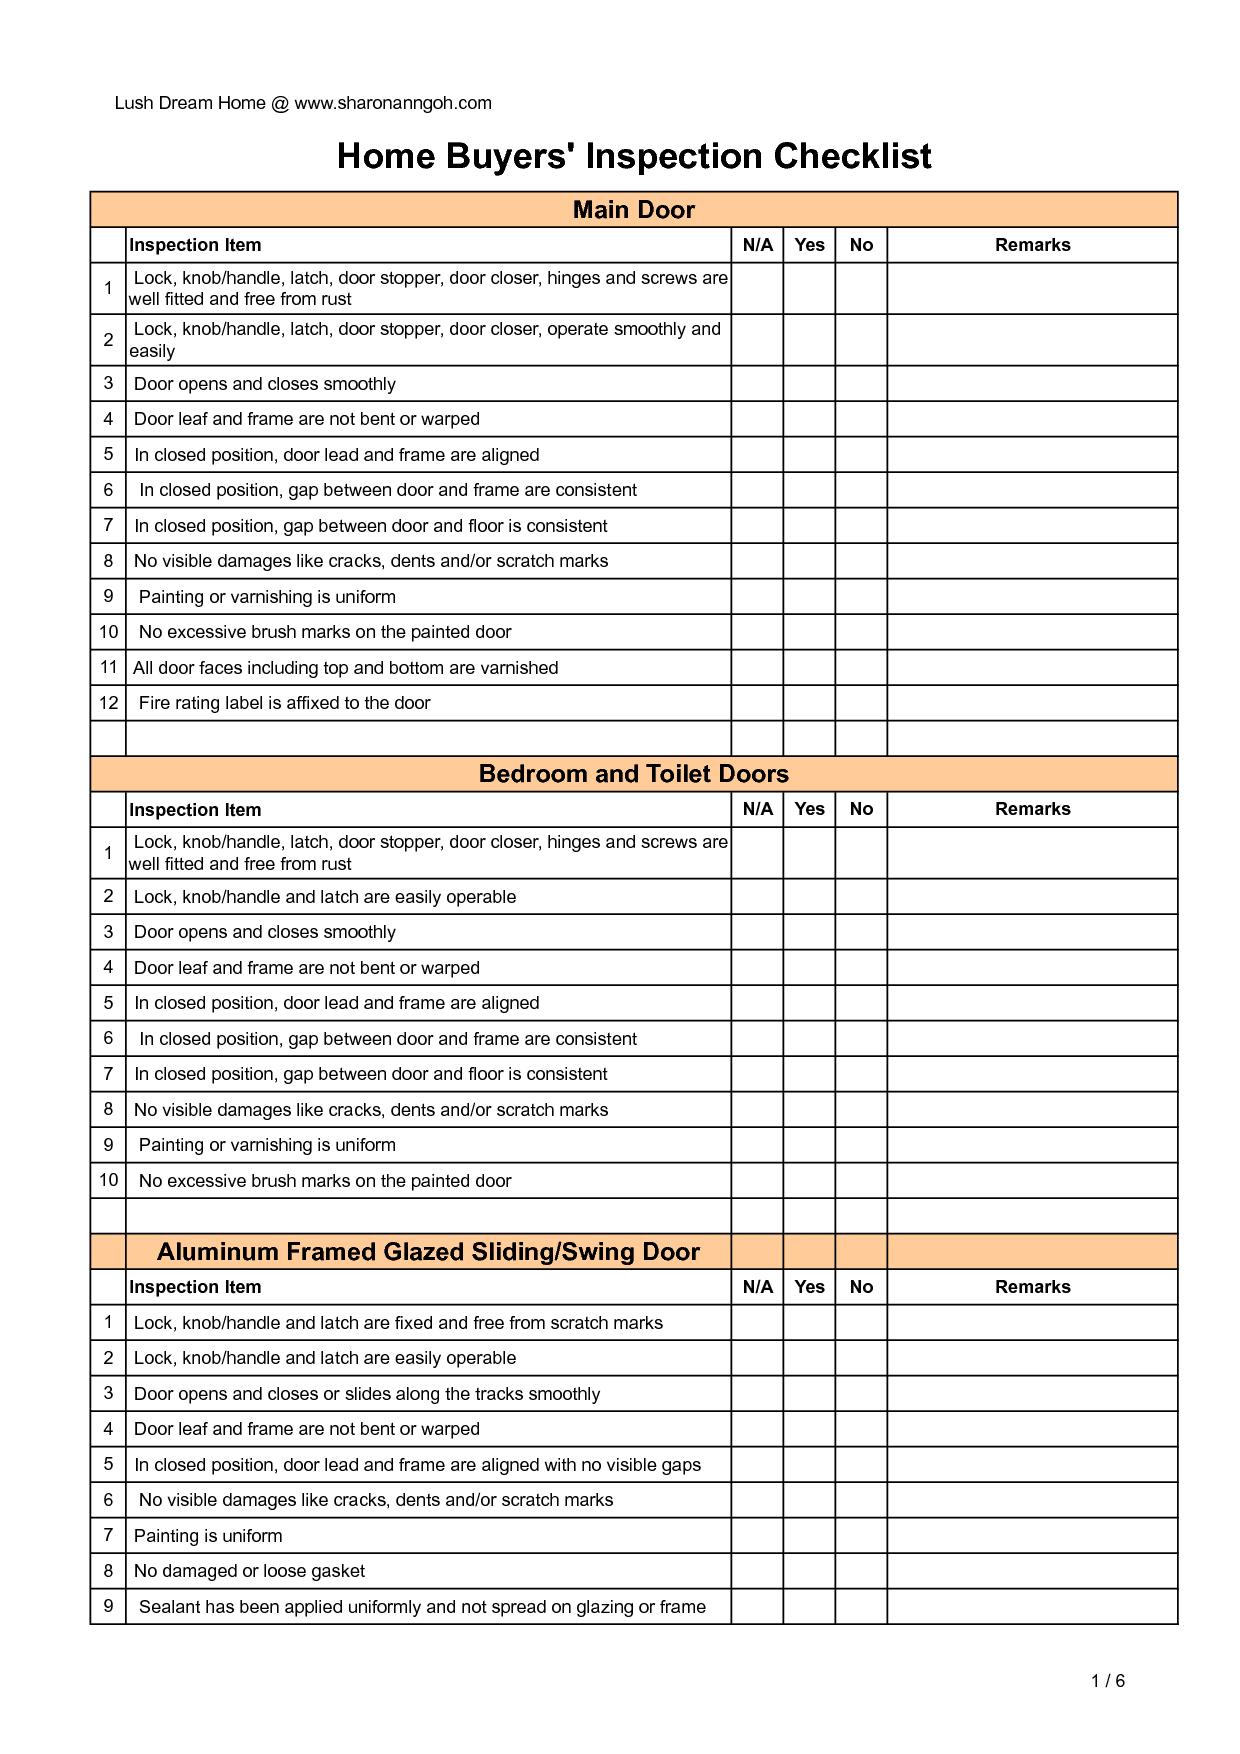 Buyer Home Inspection Checklist